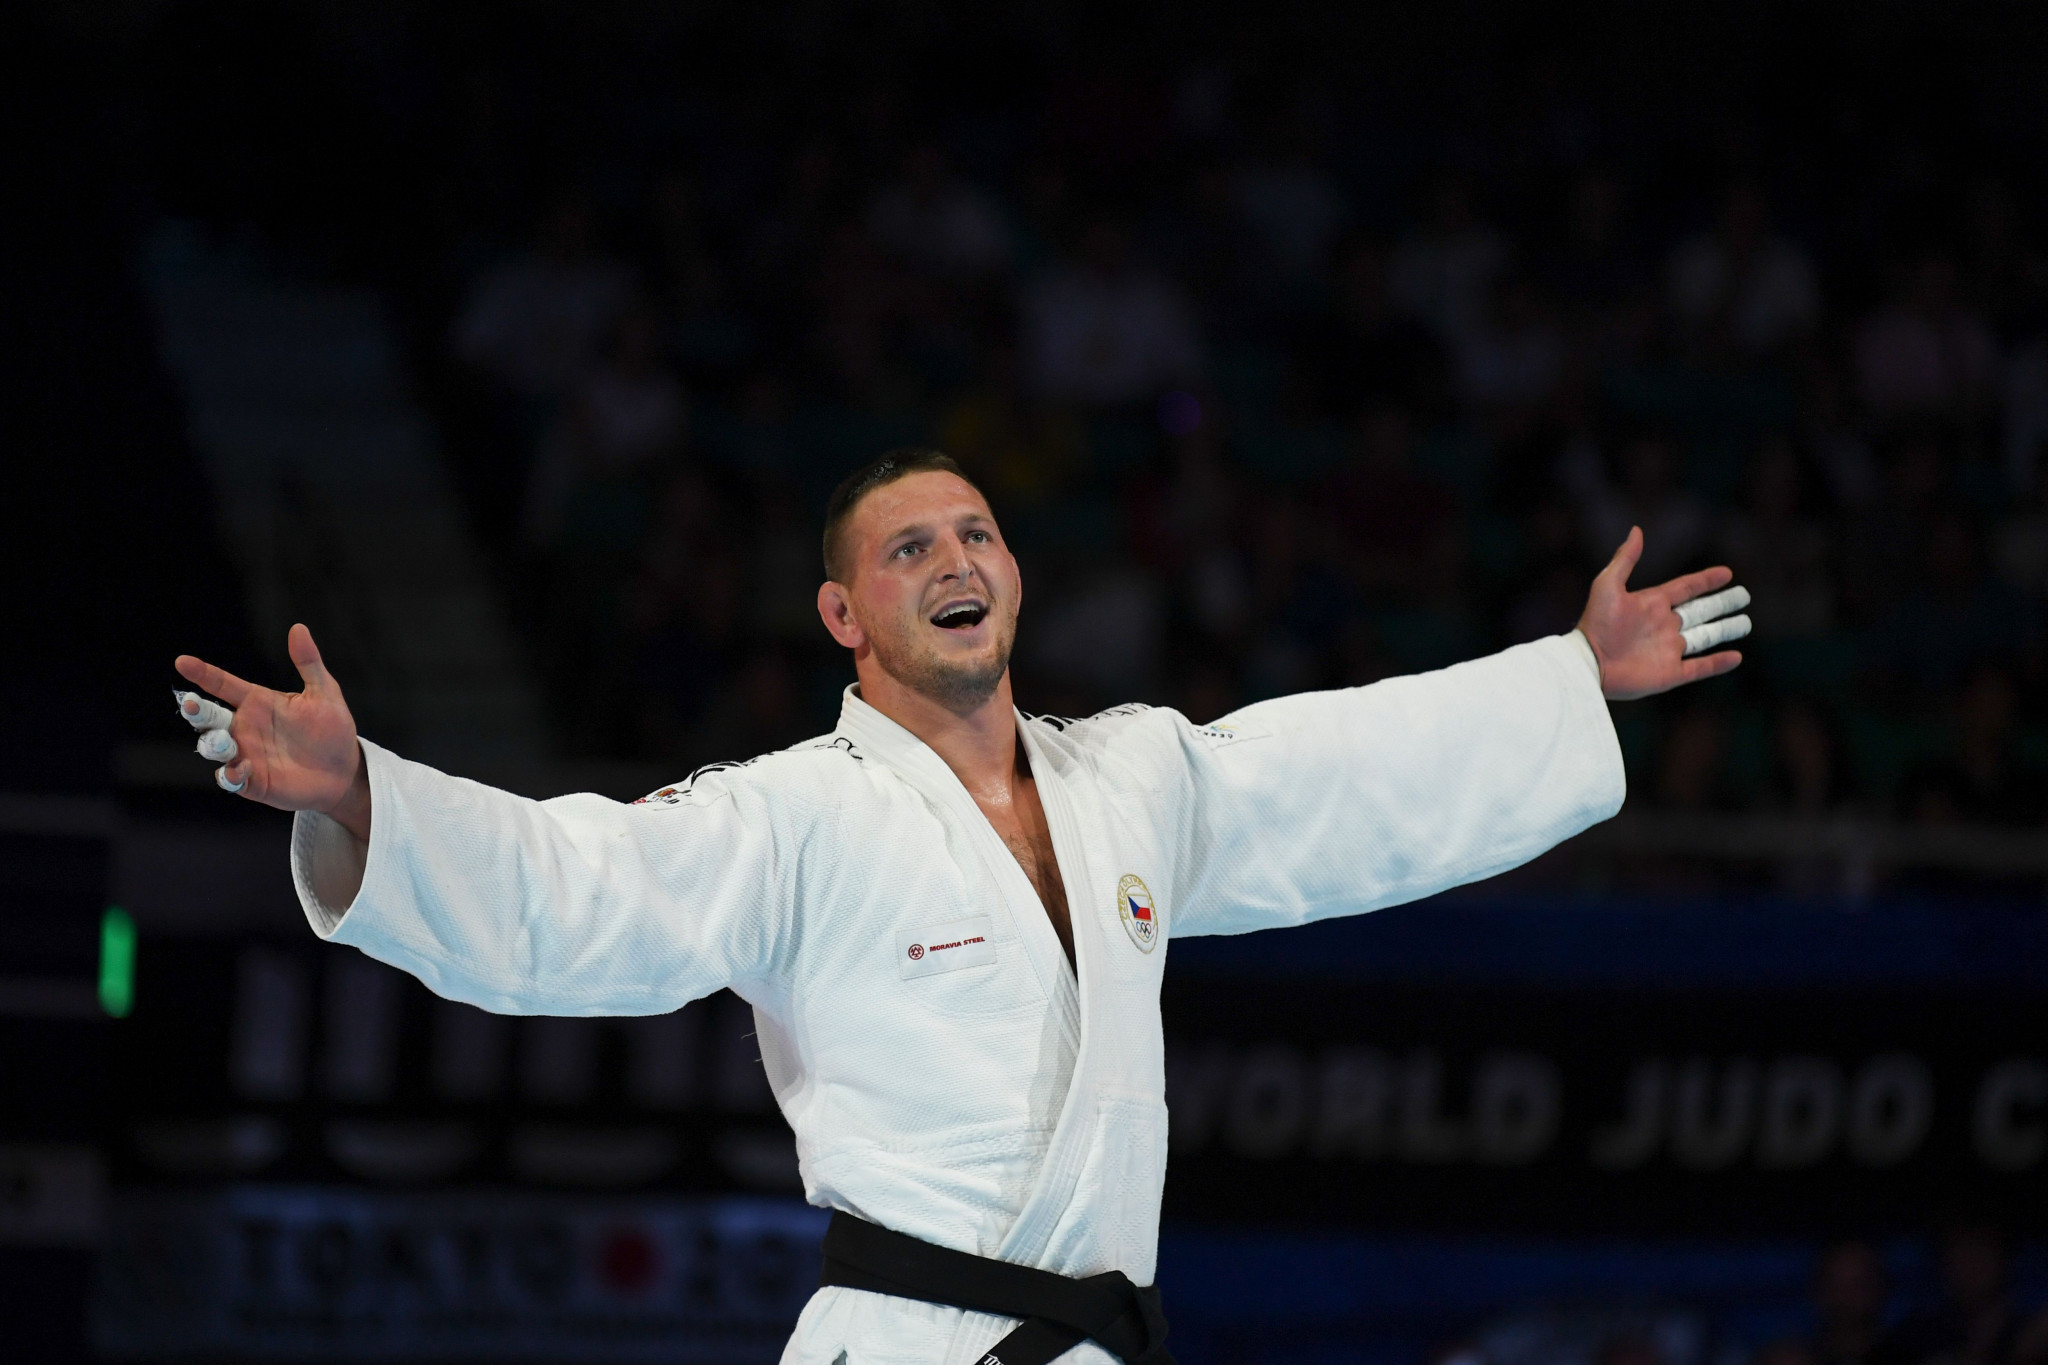 Olympic champion Krpálek leads European Judo Championships field in Prague